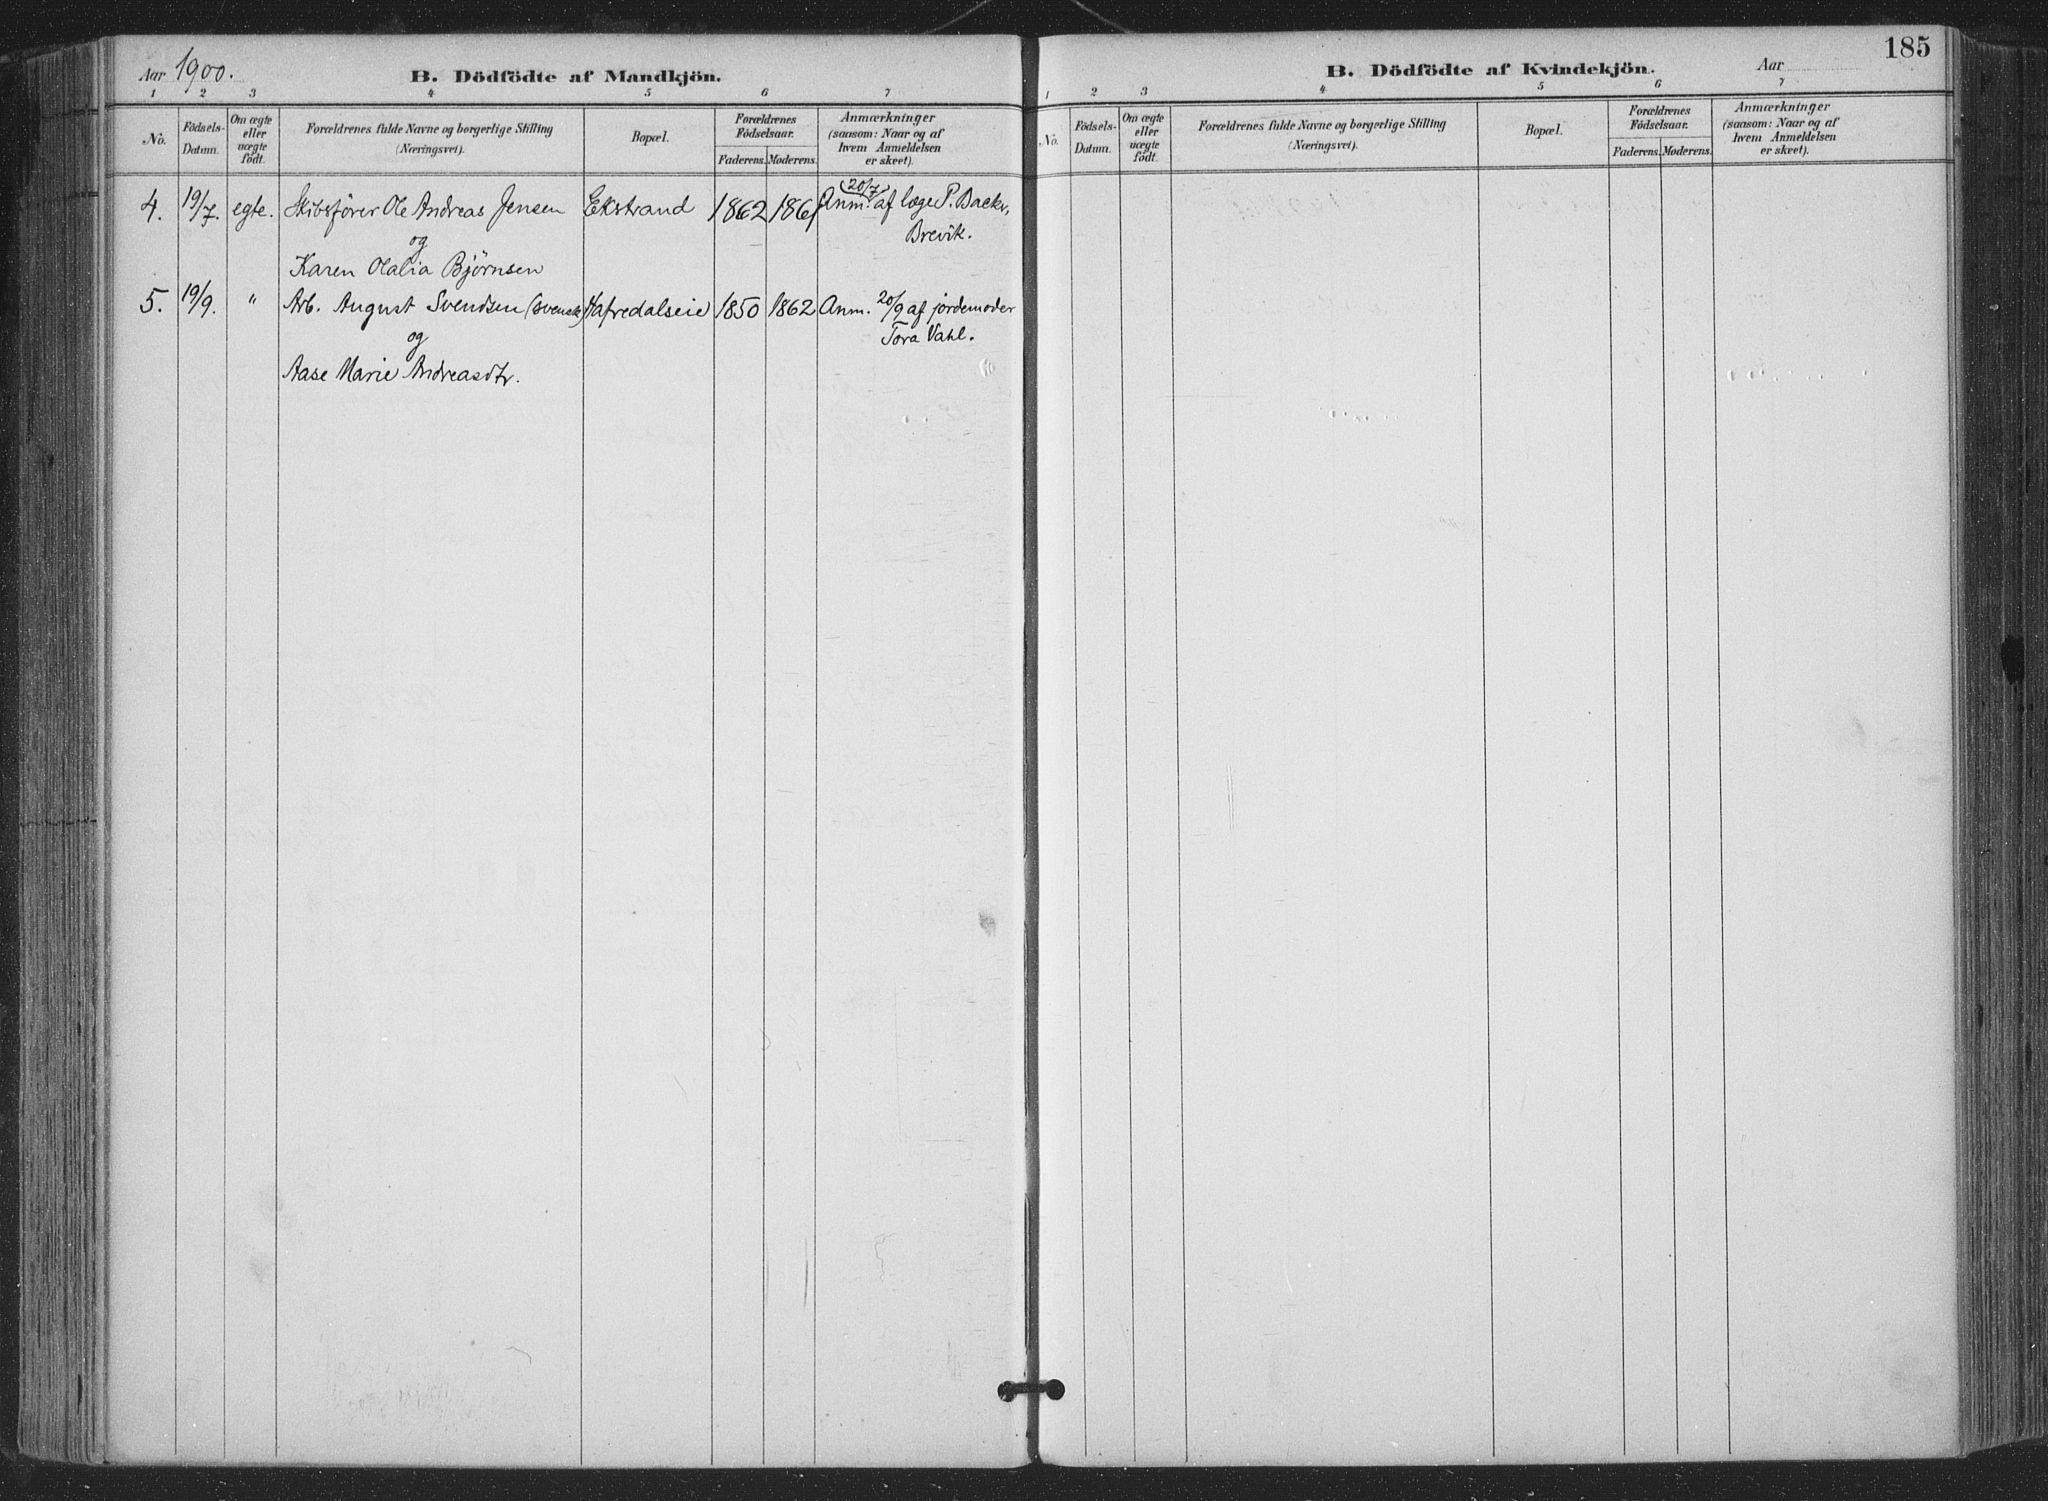 SAKO, Bamble kirkebøker, F/Fa/L0008: Ministerialbok nr. I 8, 1888-1900, s. 185